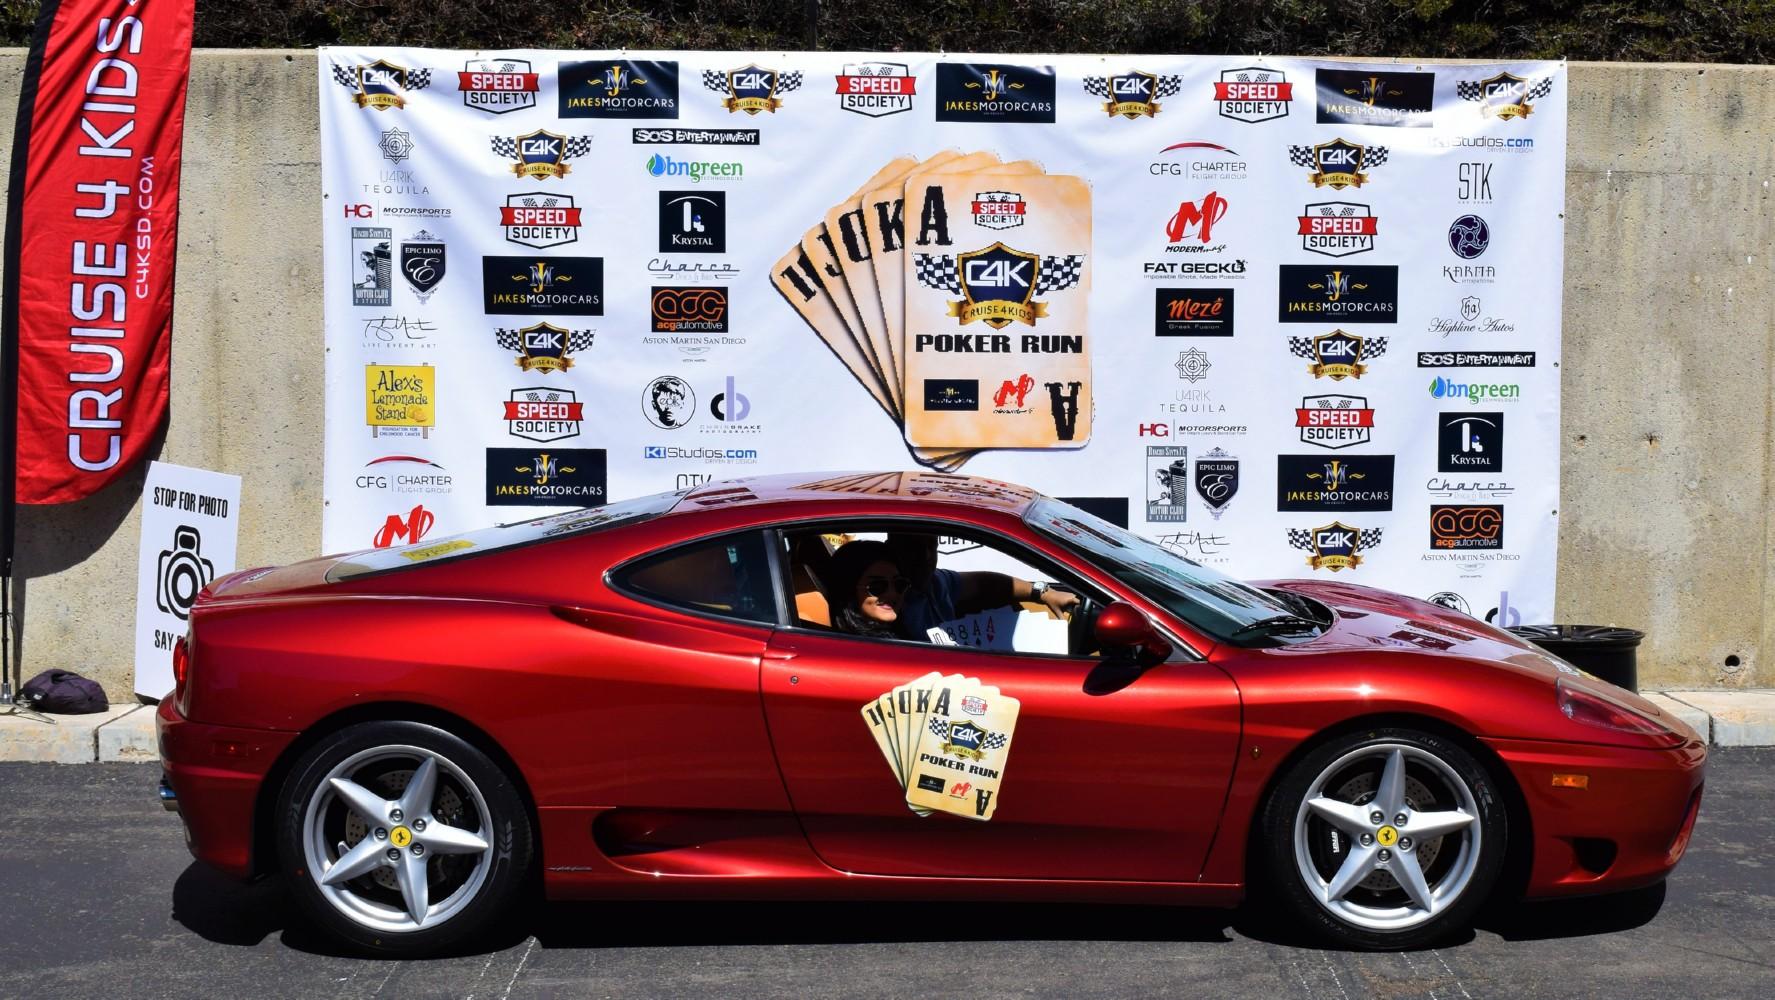 Poker Run 2017 Banner Photos - 49.jpg